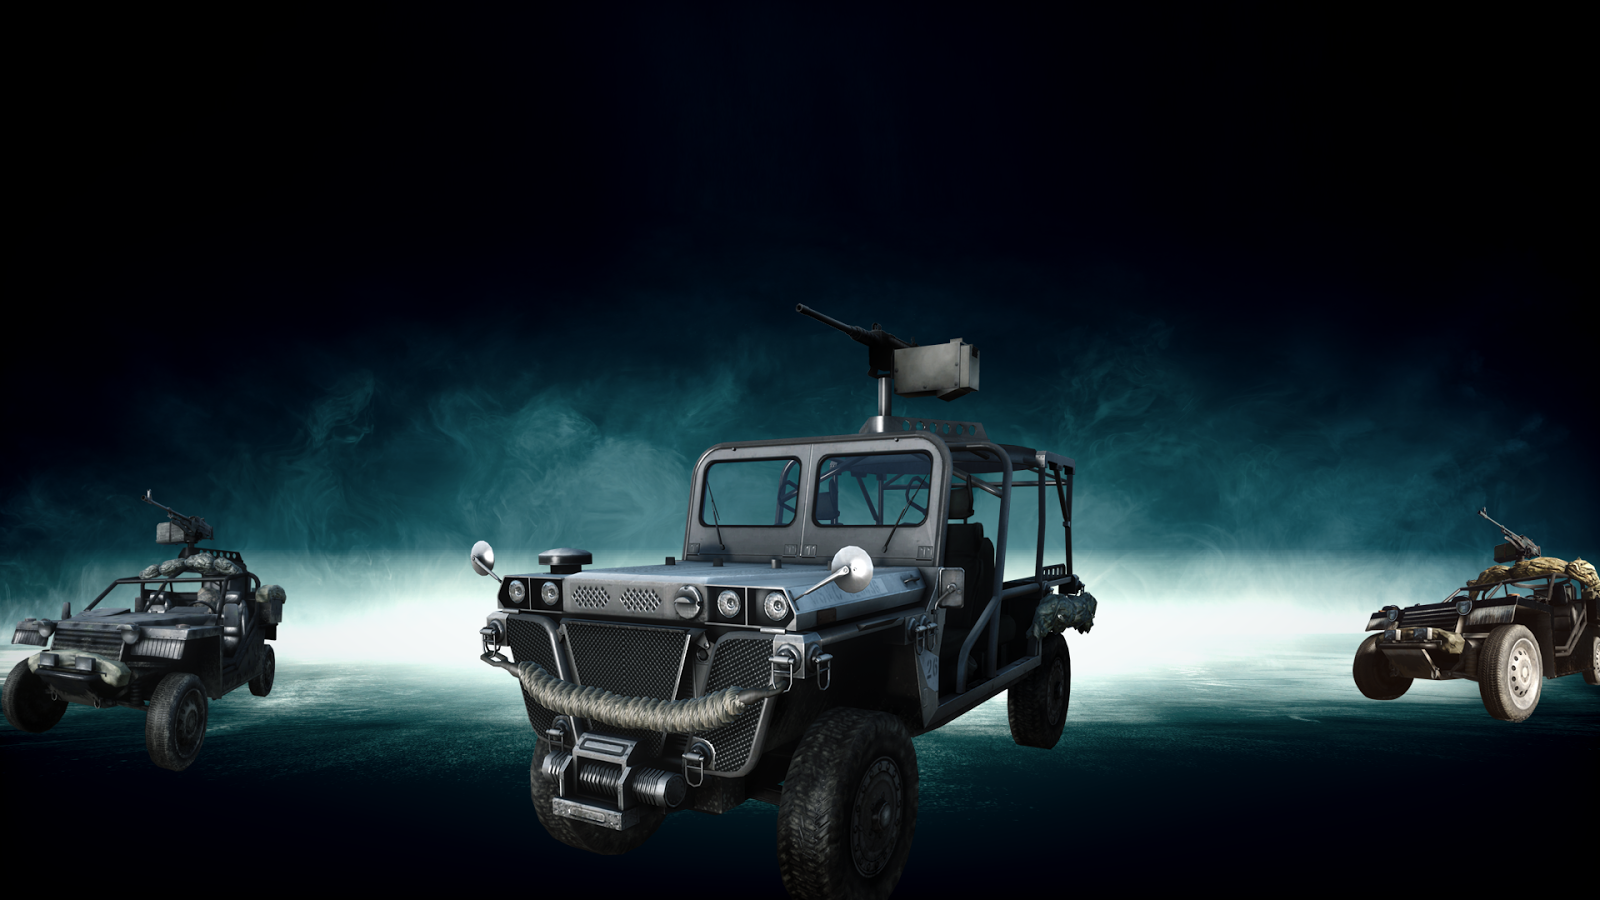 modo de jogo jeep superiority no battlefield 4. Black Bedroom Furniture Sets. Home Design Ideas